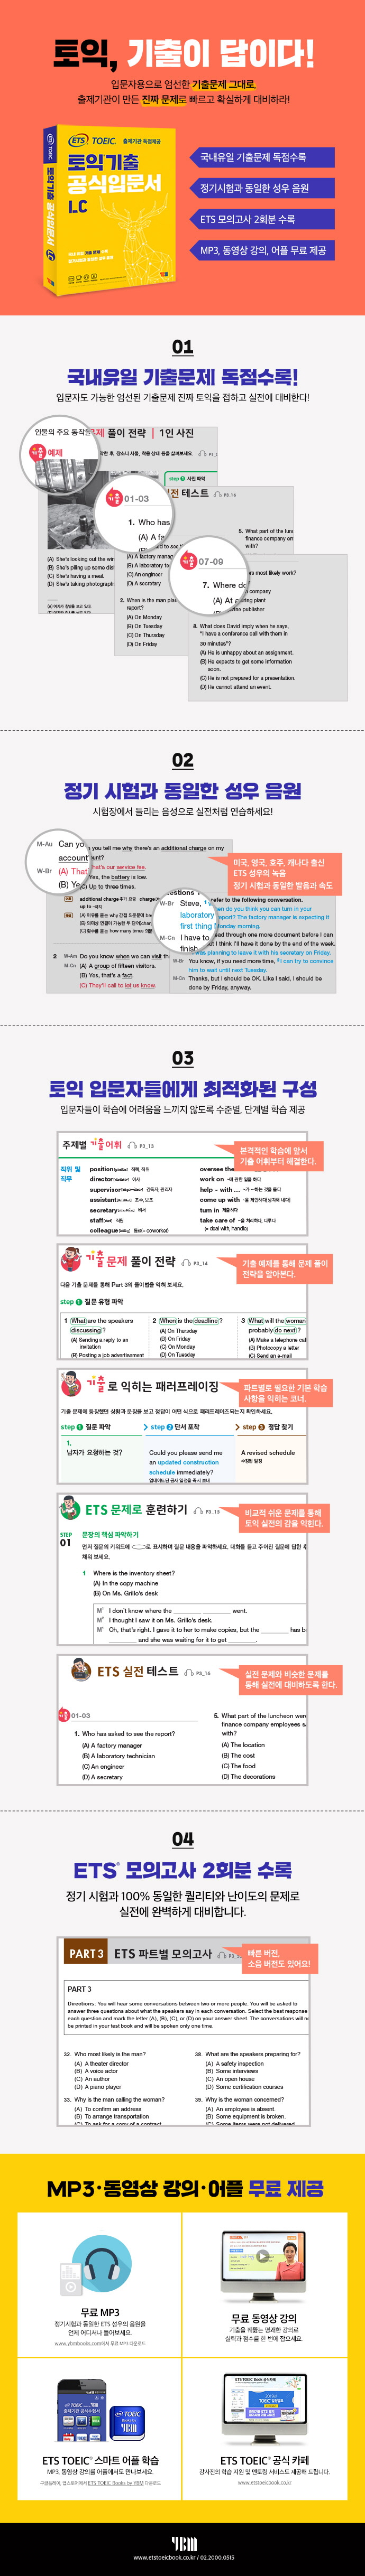 ETS 토익기출 공식입문서 LC 도서 상세이미지